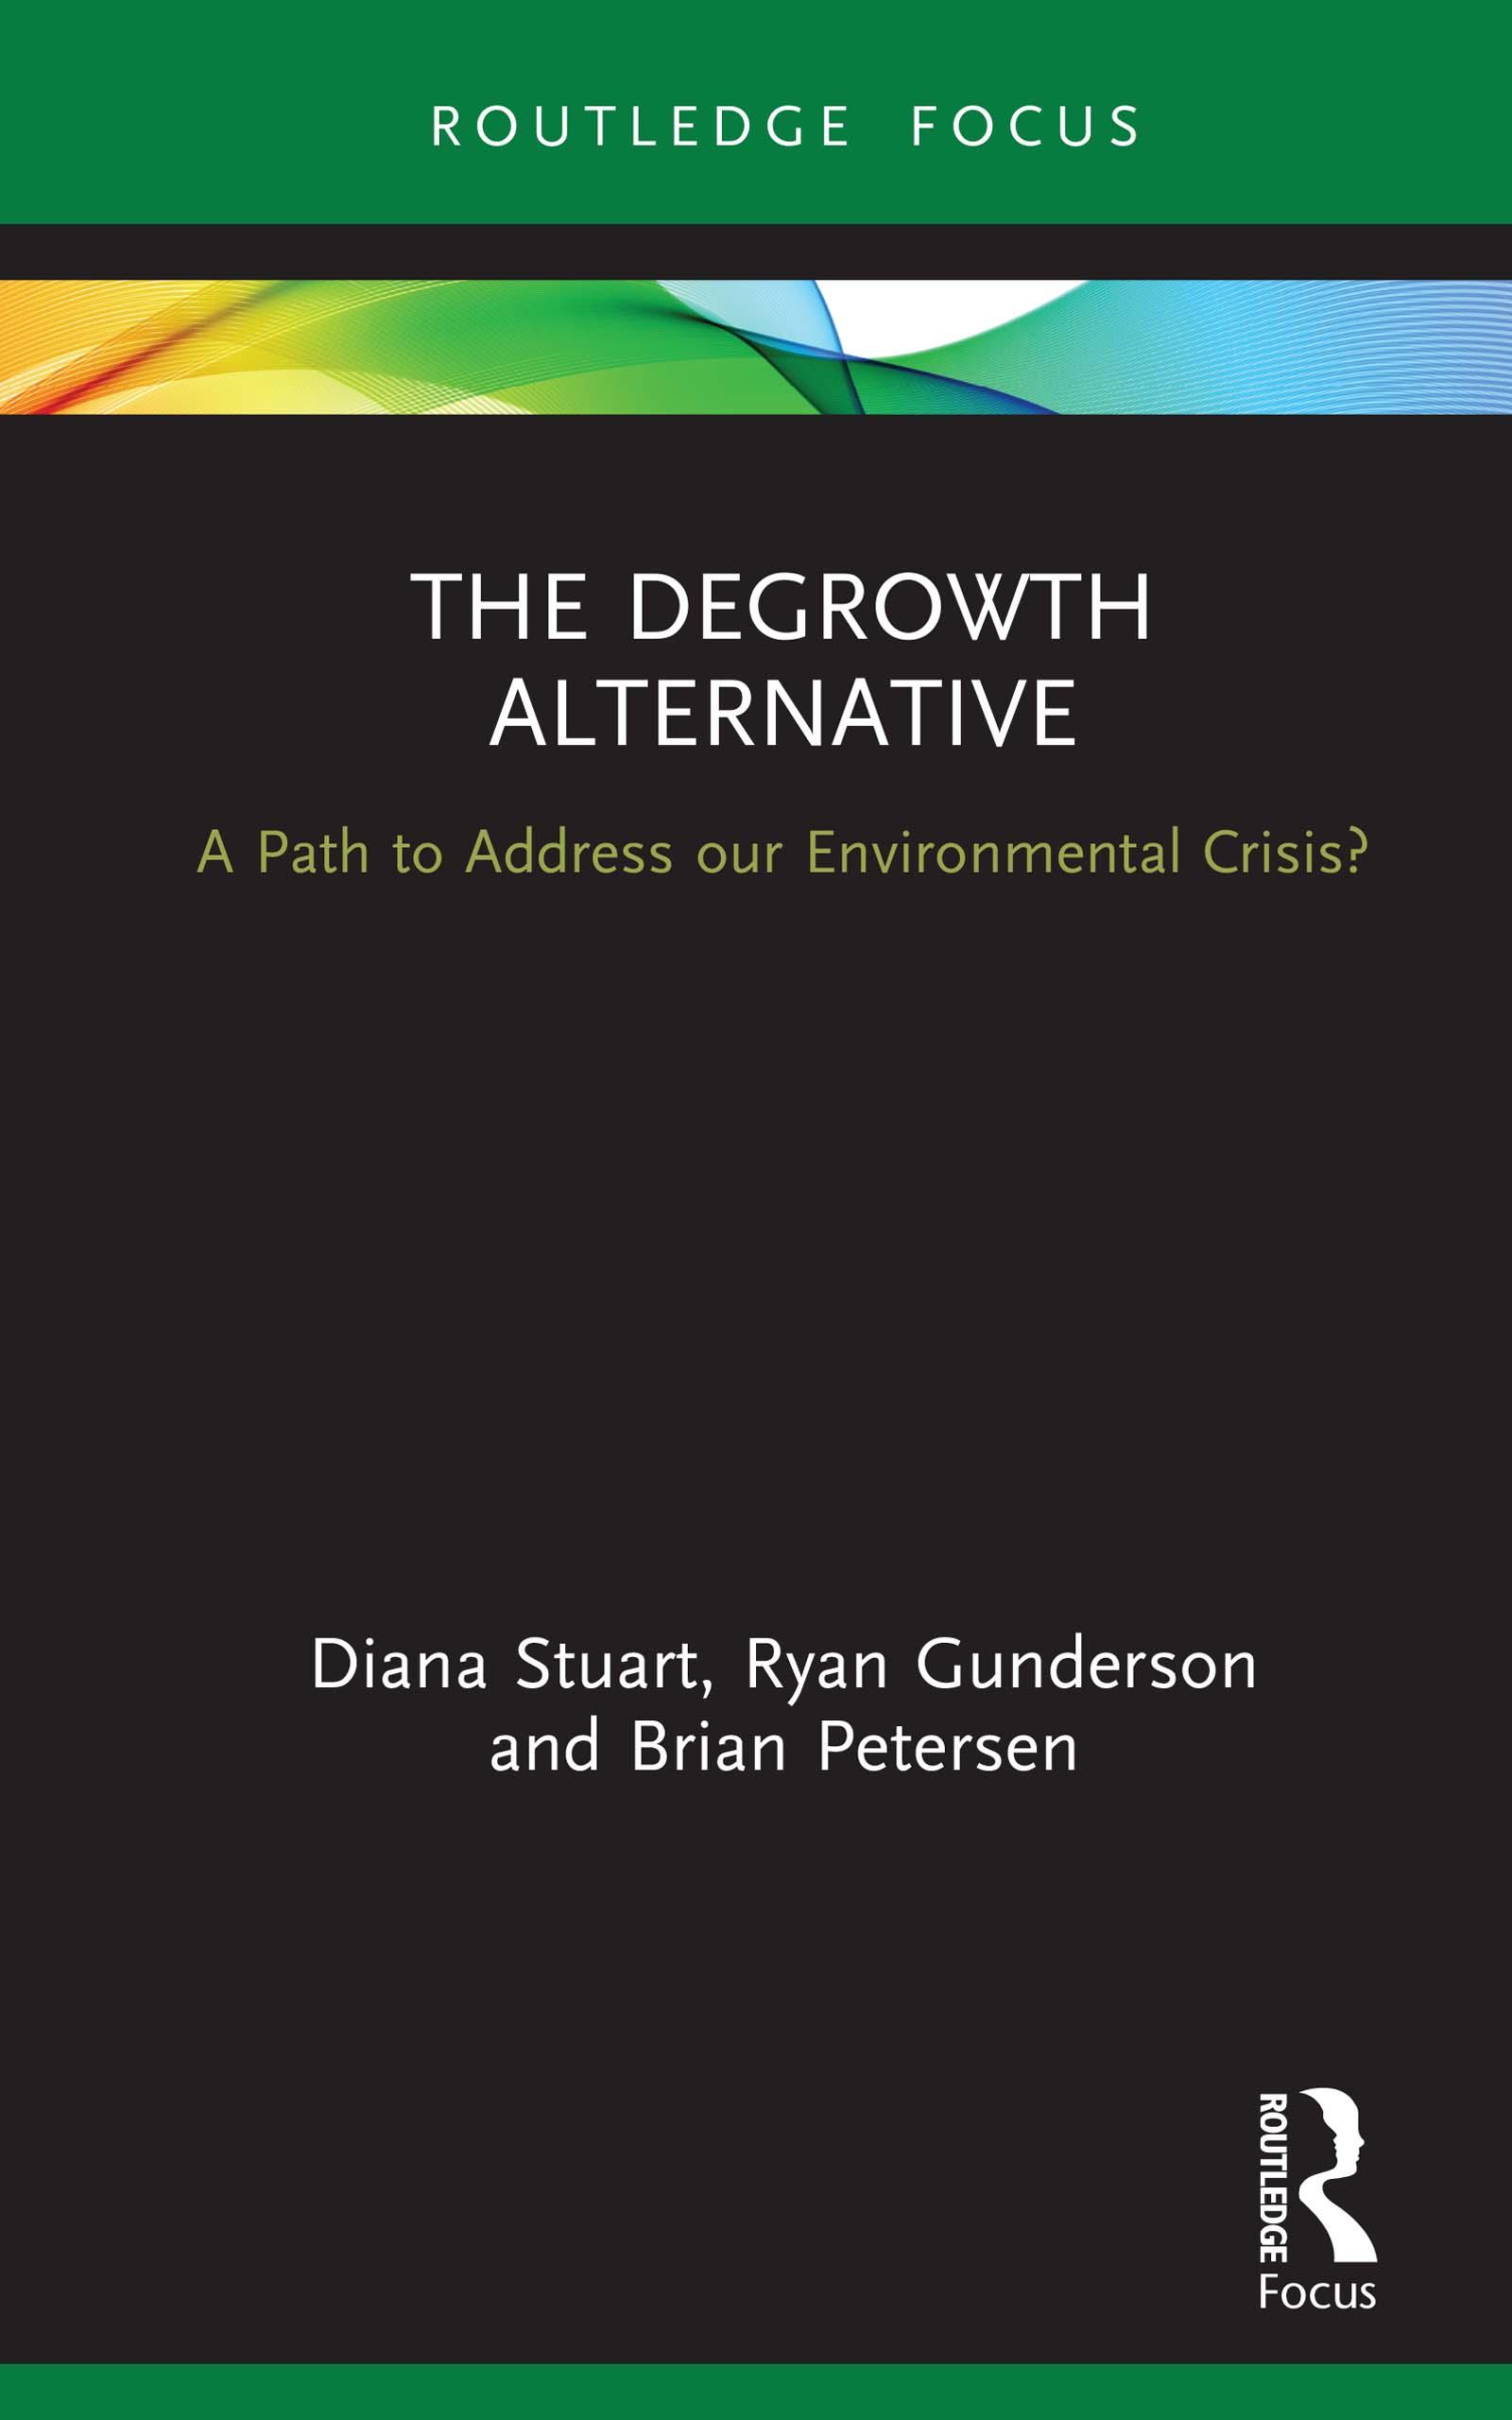 The degrowth alternative